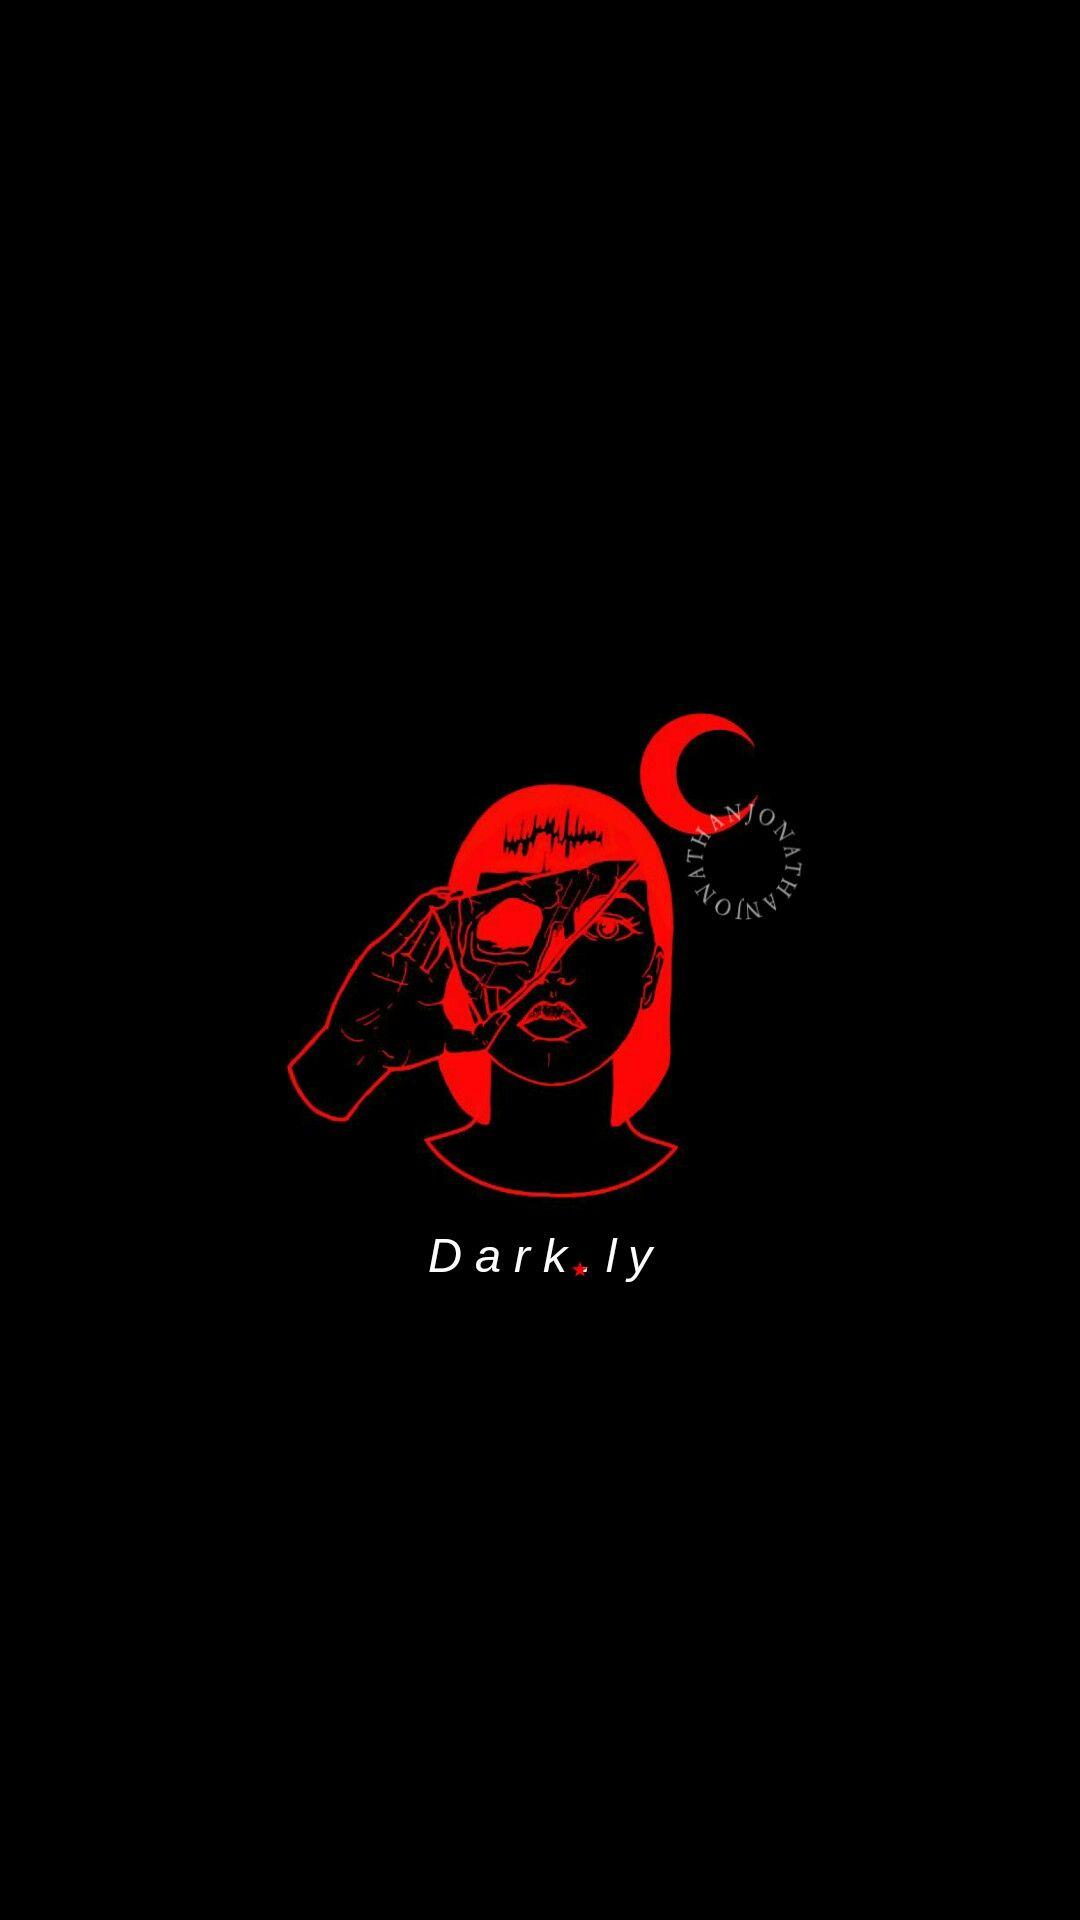 Wallpapers Aesthetic Dark Blak Red Dark Aesthetic Mood Wallpaper Aesthetic Wallpapers